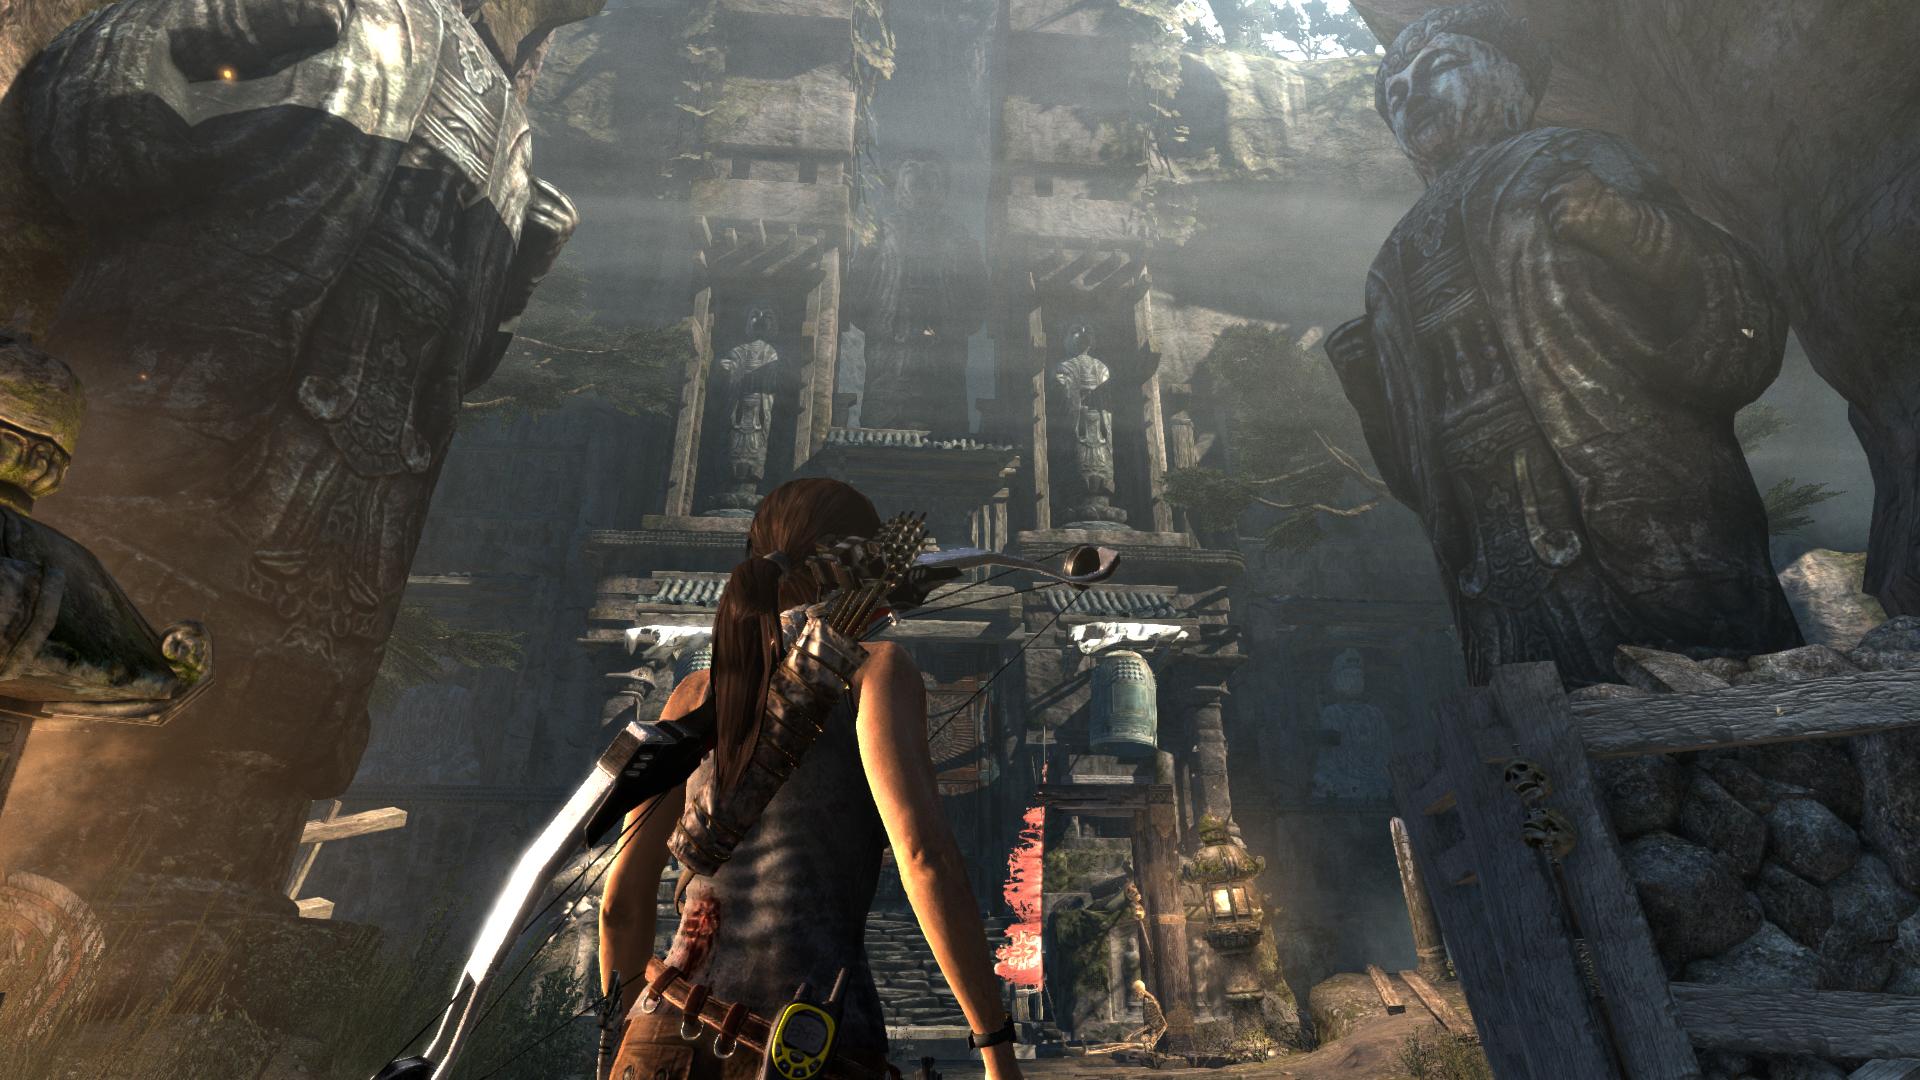 Tomb Raider Screenshots Explore Temple, Fight Samurai #25782